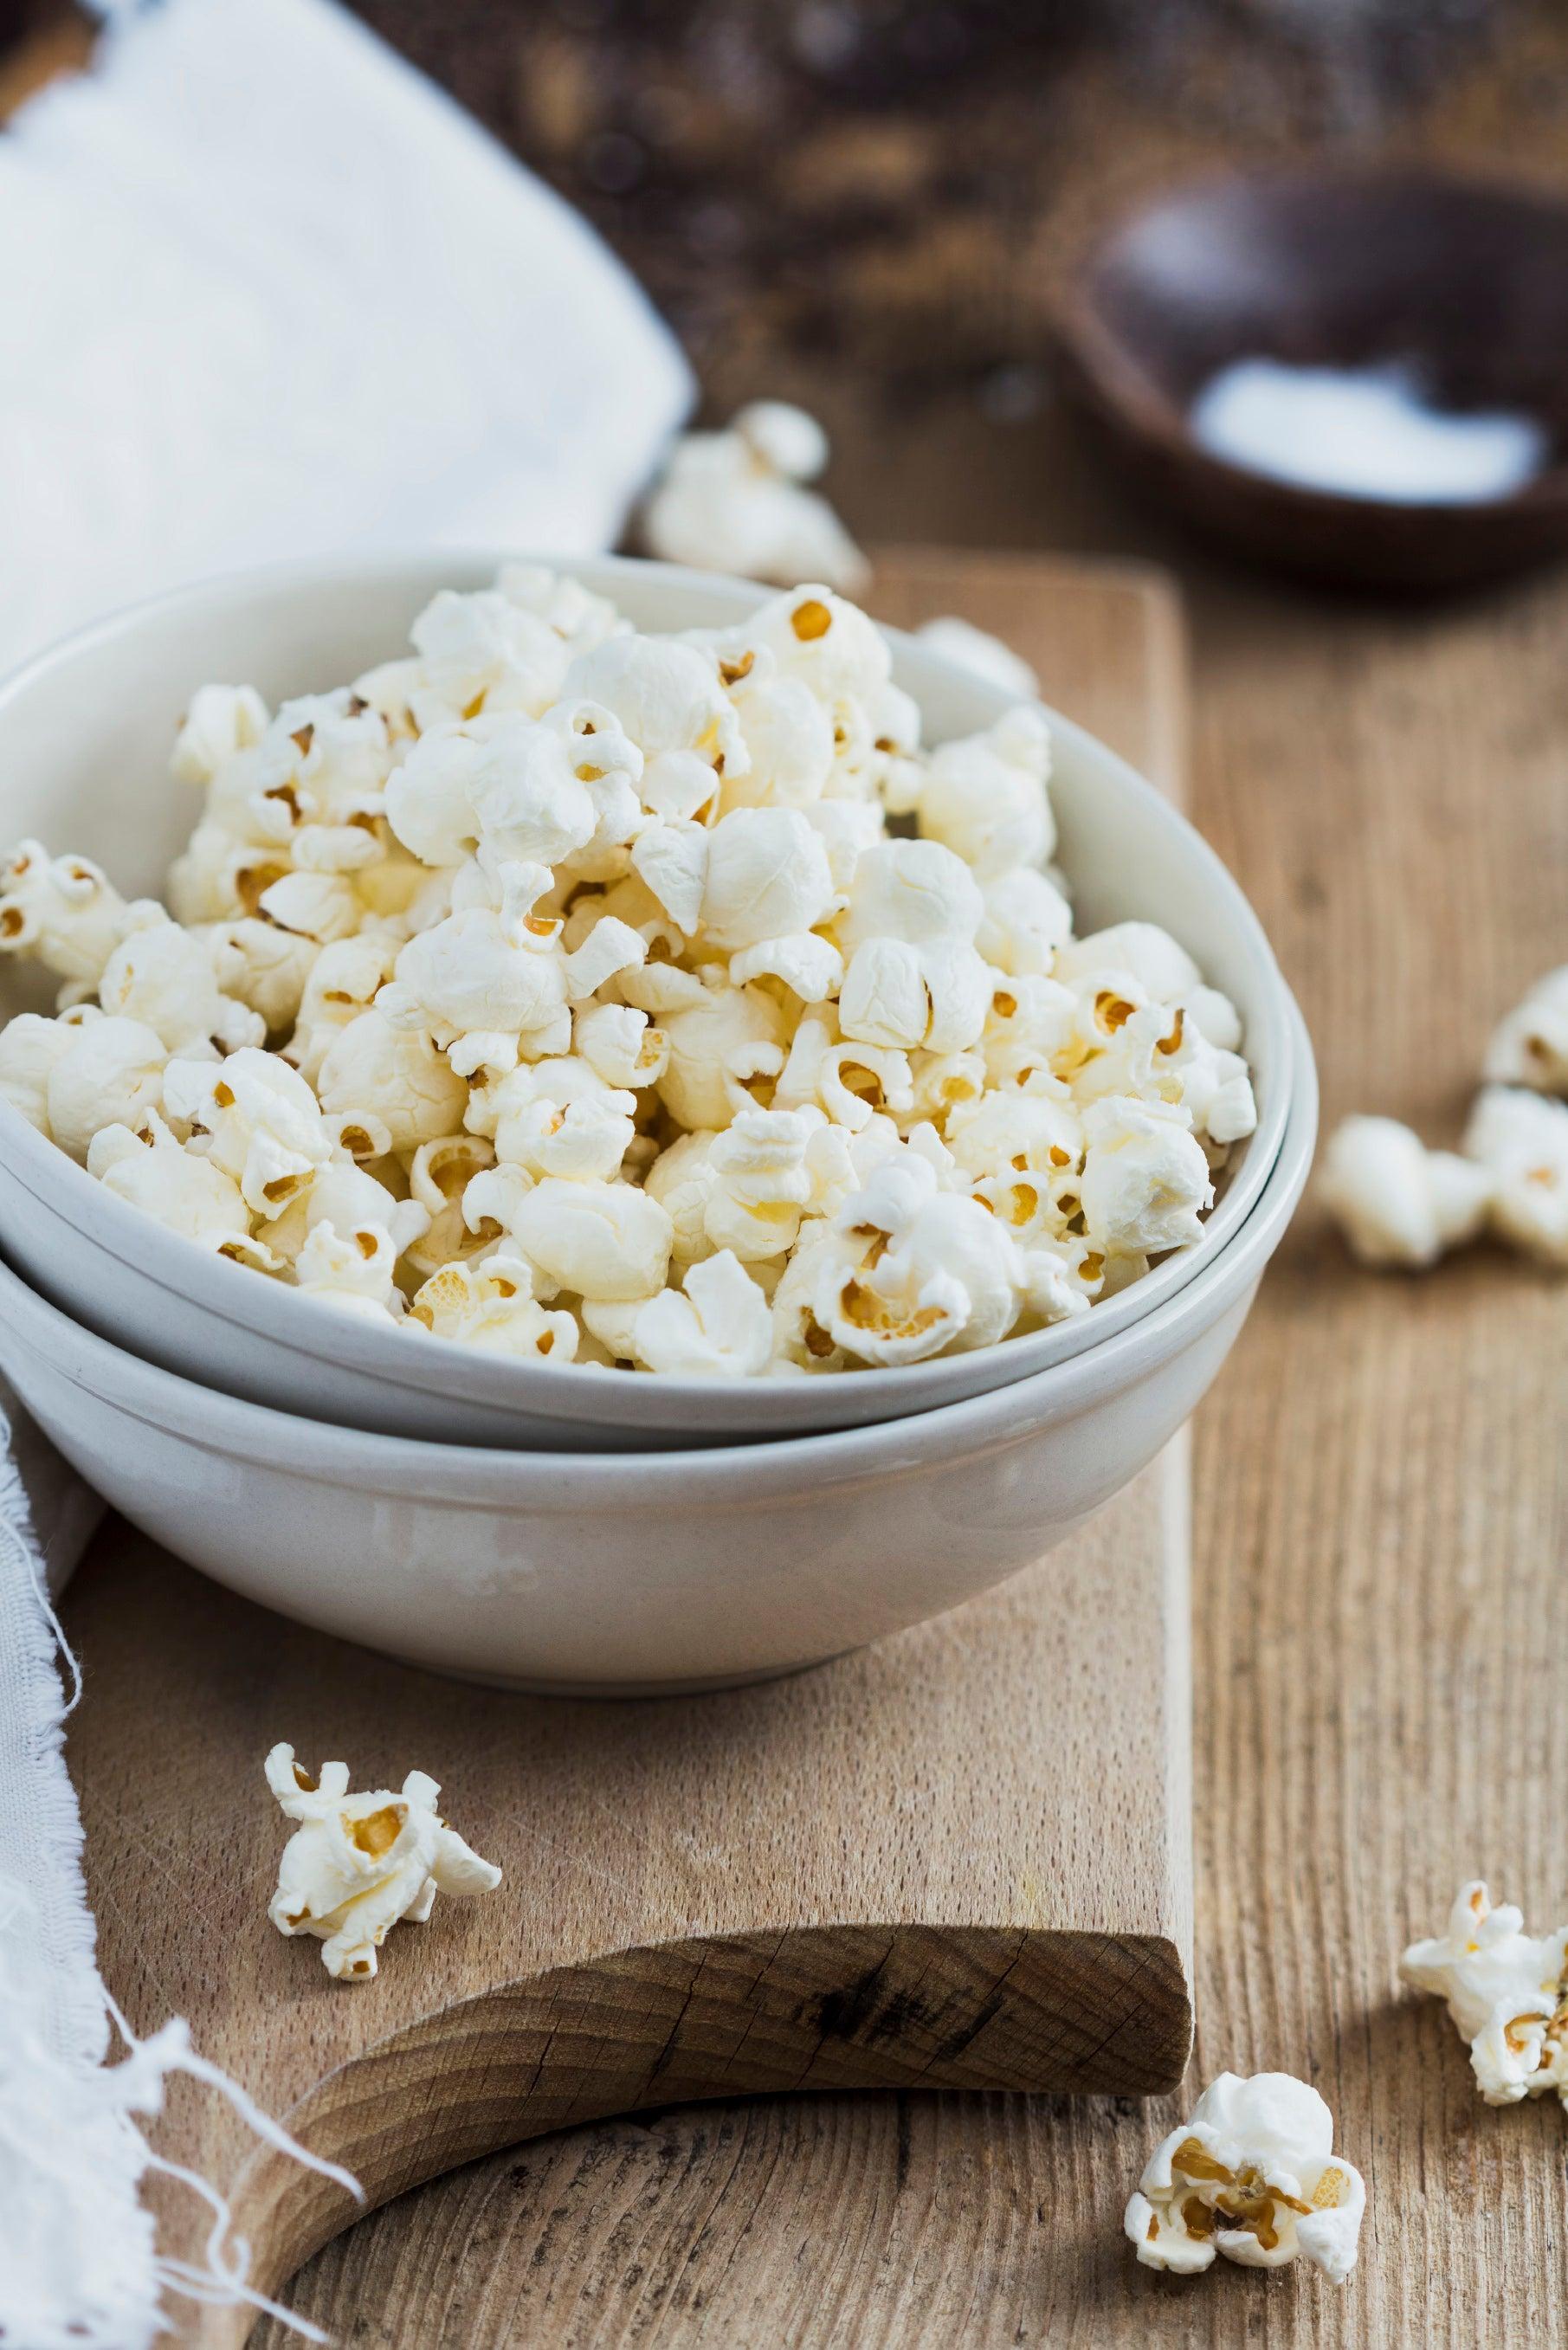 Does popcorn kernels expire